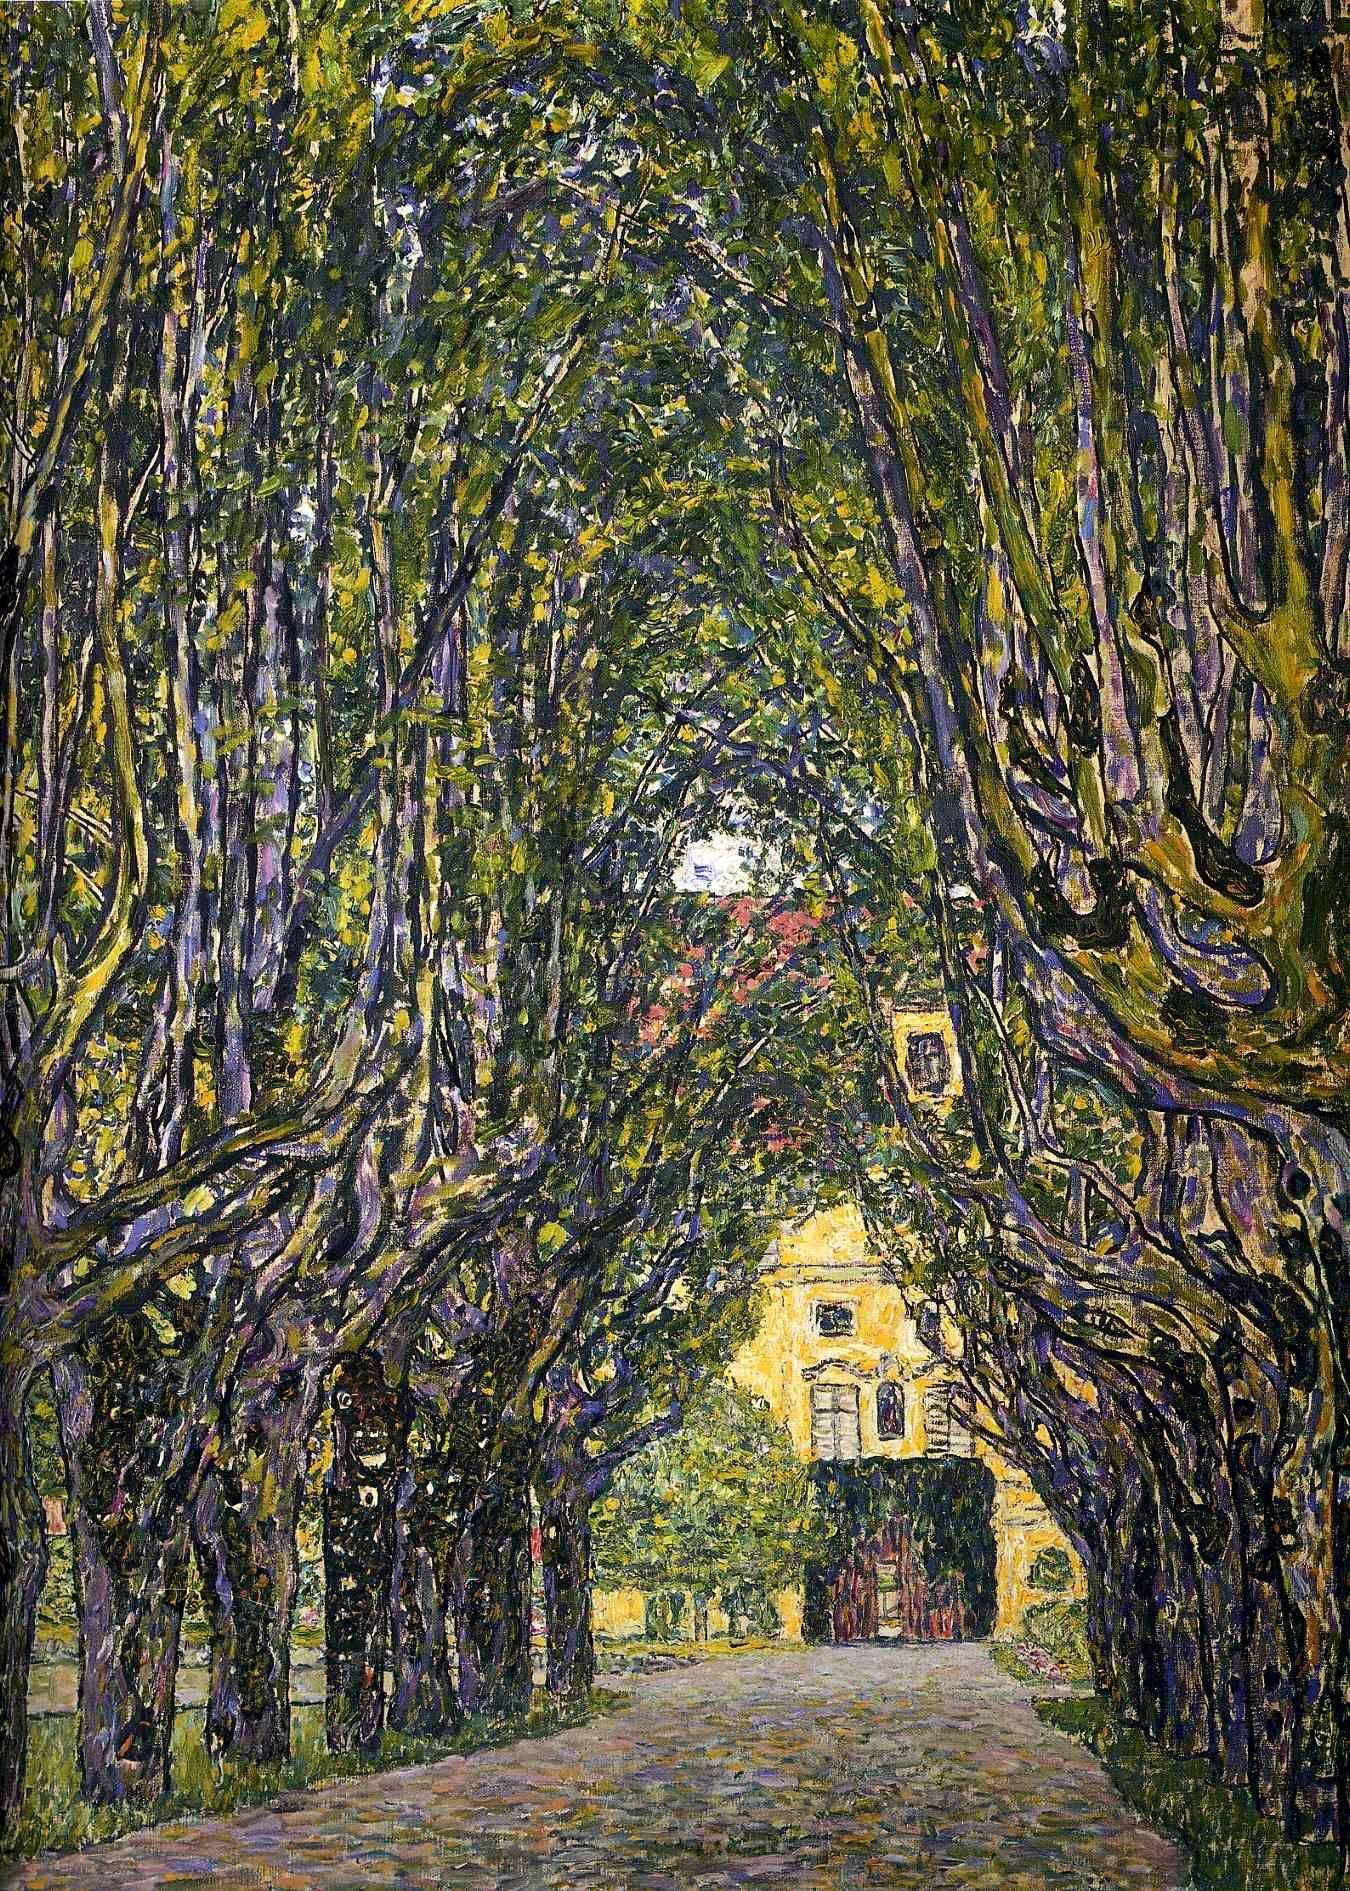 Pin By Mark Dylan Sieber On Gustav Klimt Landscapes Townscapes Klimt Klimt Art Gustav Klimt Art